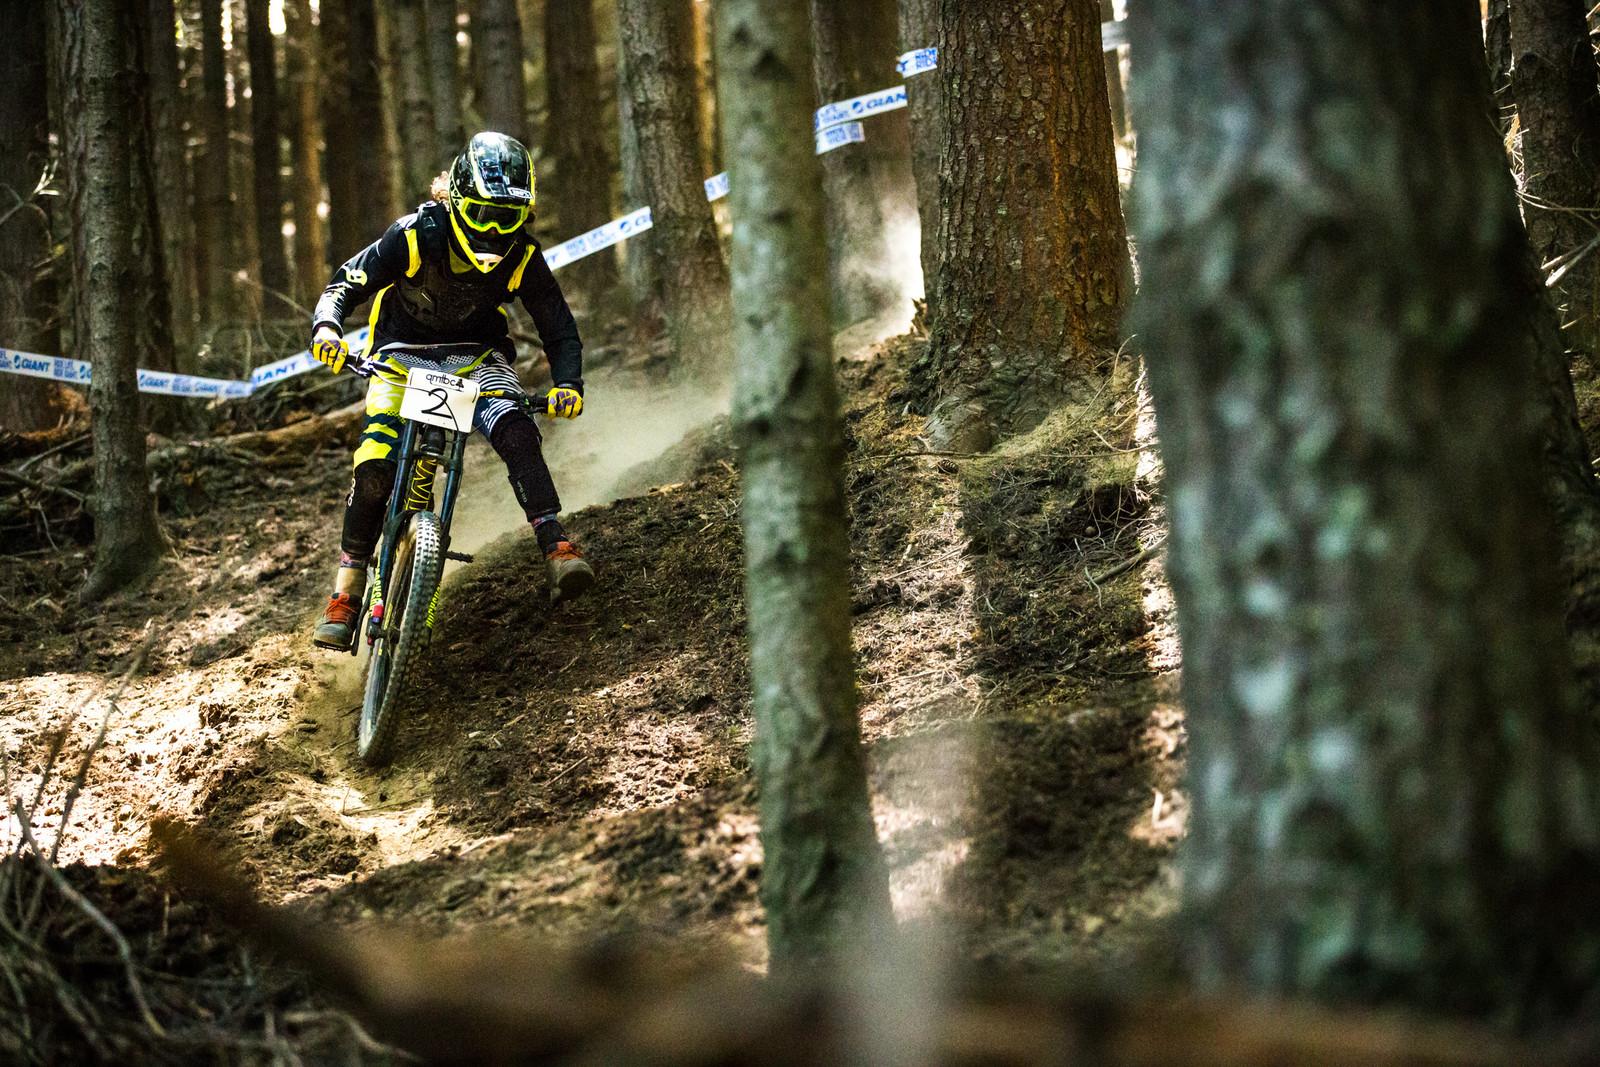 Pang Pushing - Homegrown NZ Downhill - Vertigo Bikes Ride More DH Series Race 1 - Mountain Biking Pictures - Vital MTB